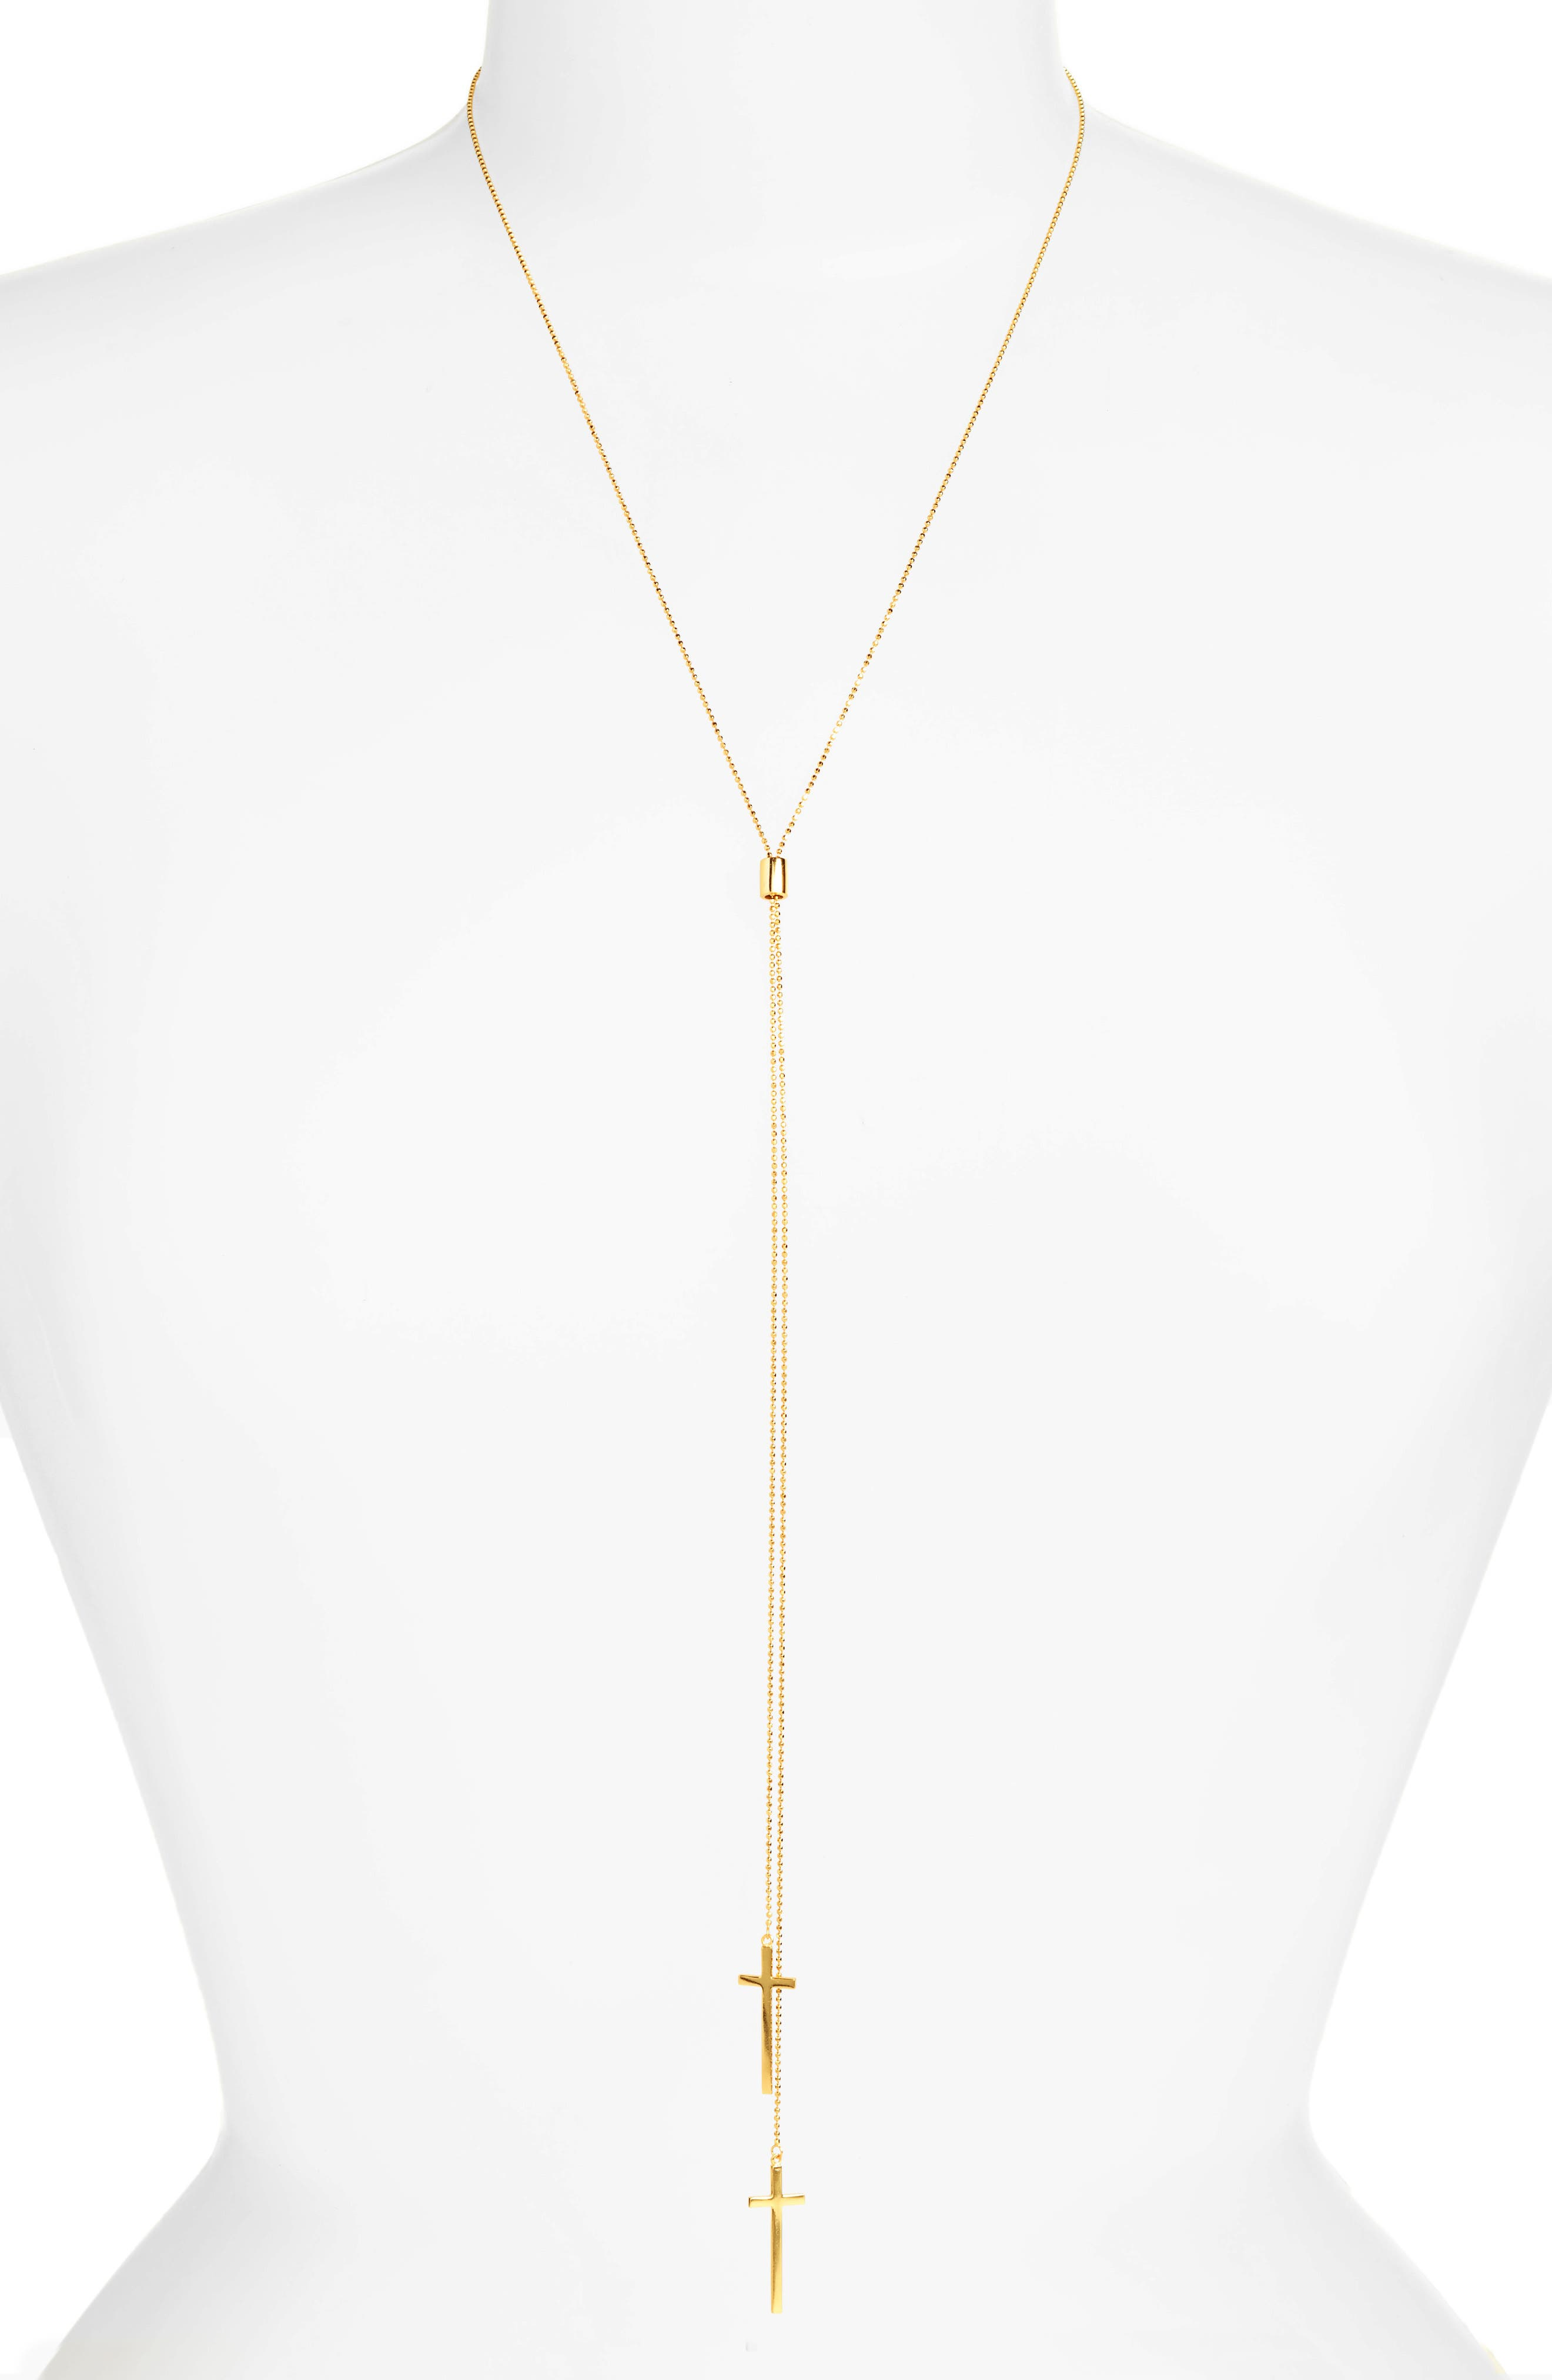 Alternate Image 1 Selected - Argento Vivo Modern Cross Lariat Necklace